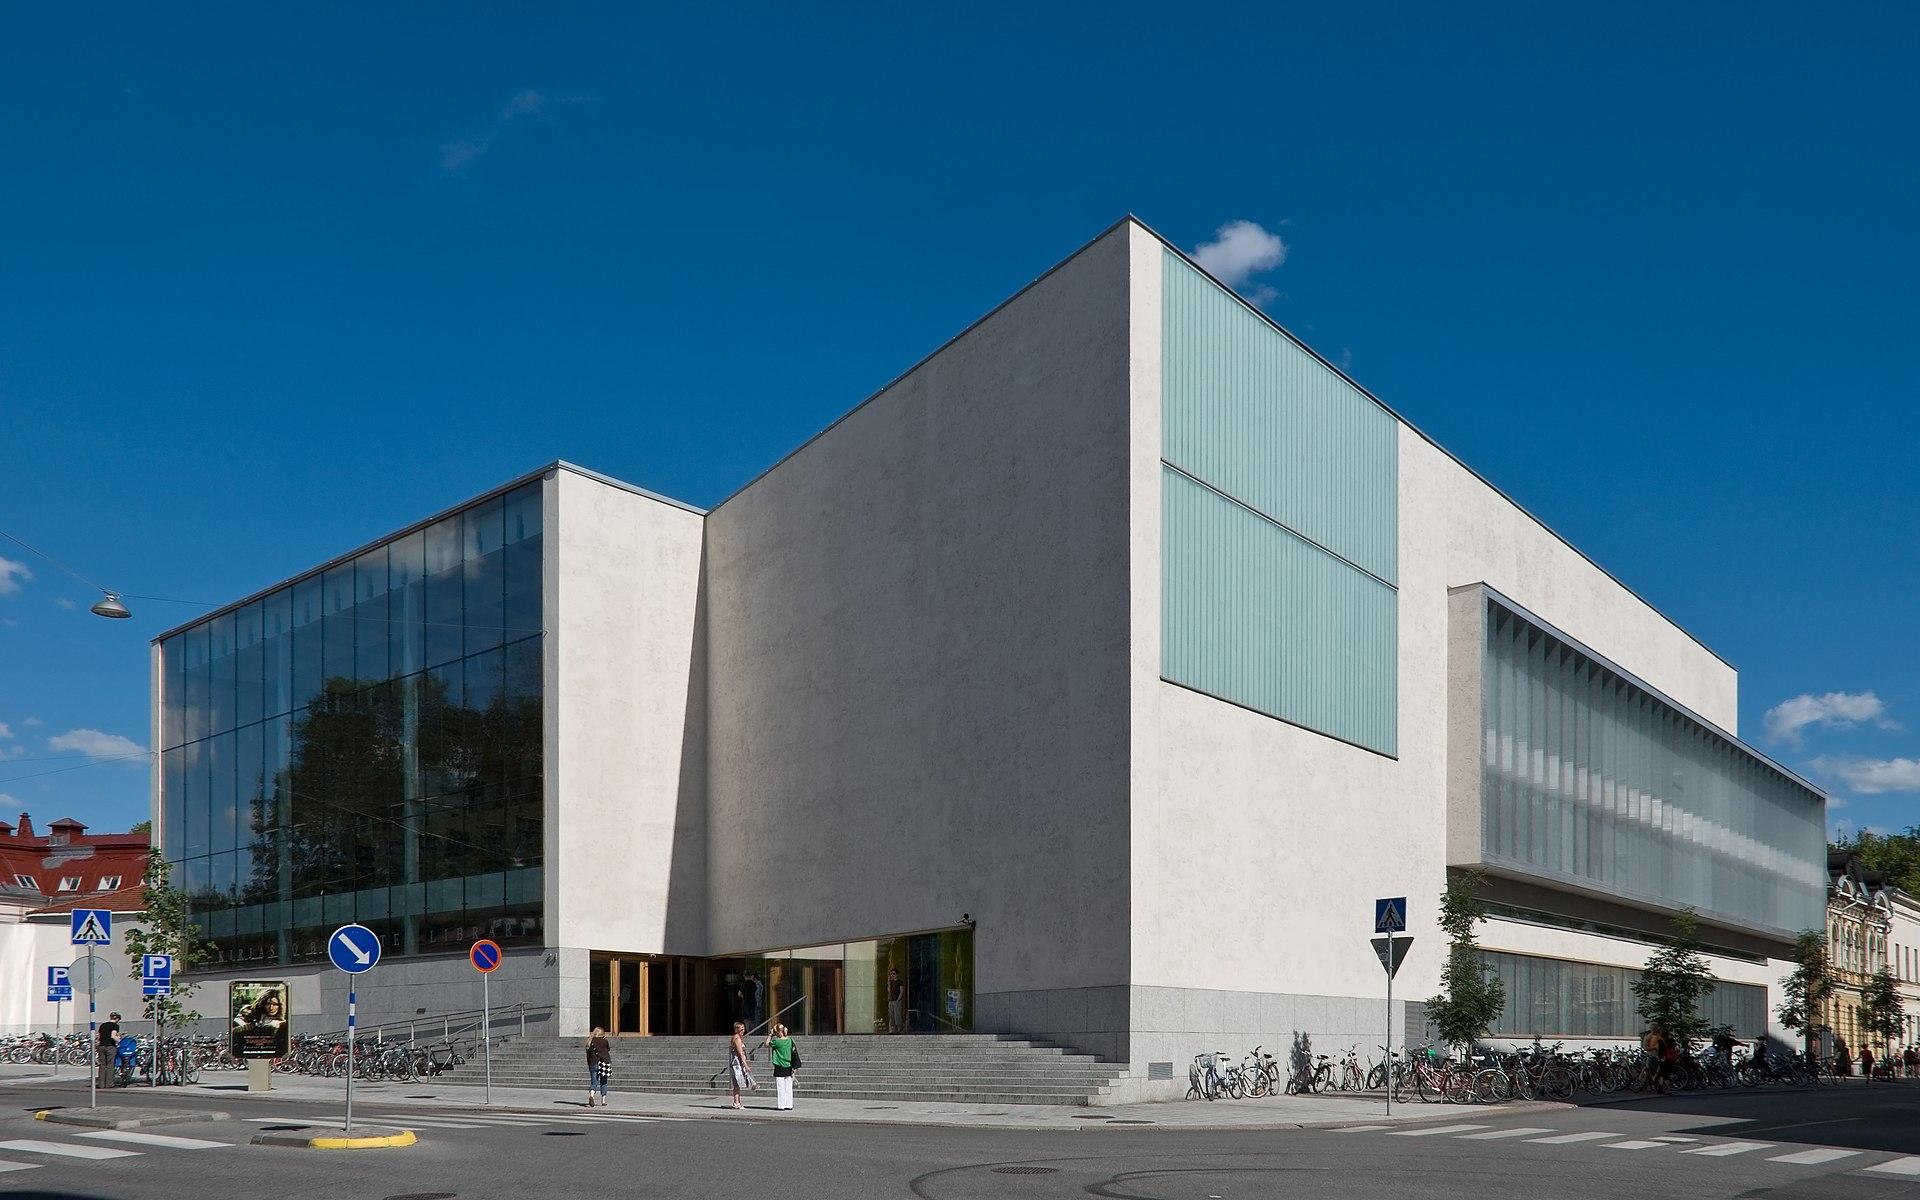 Turku Kaupunginkirjasto